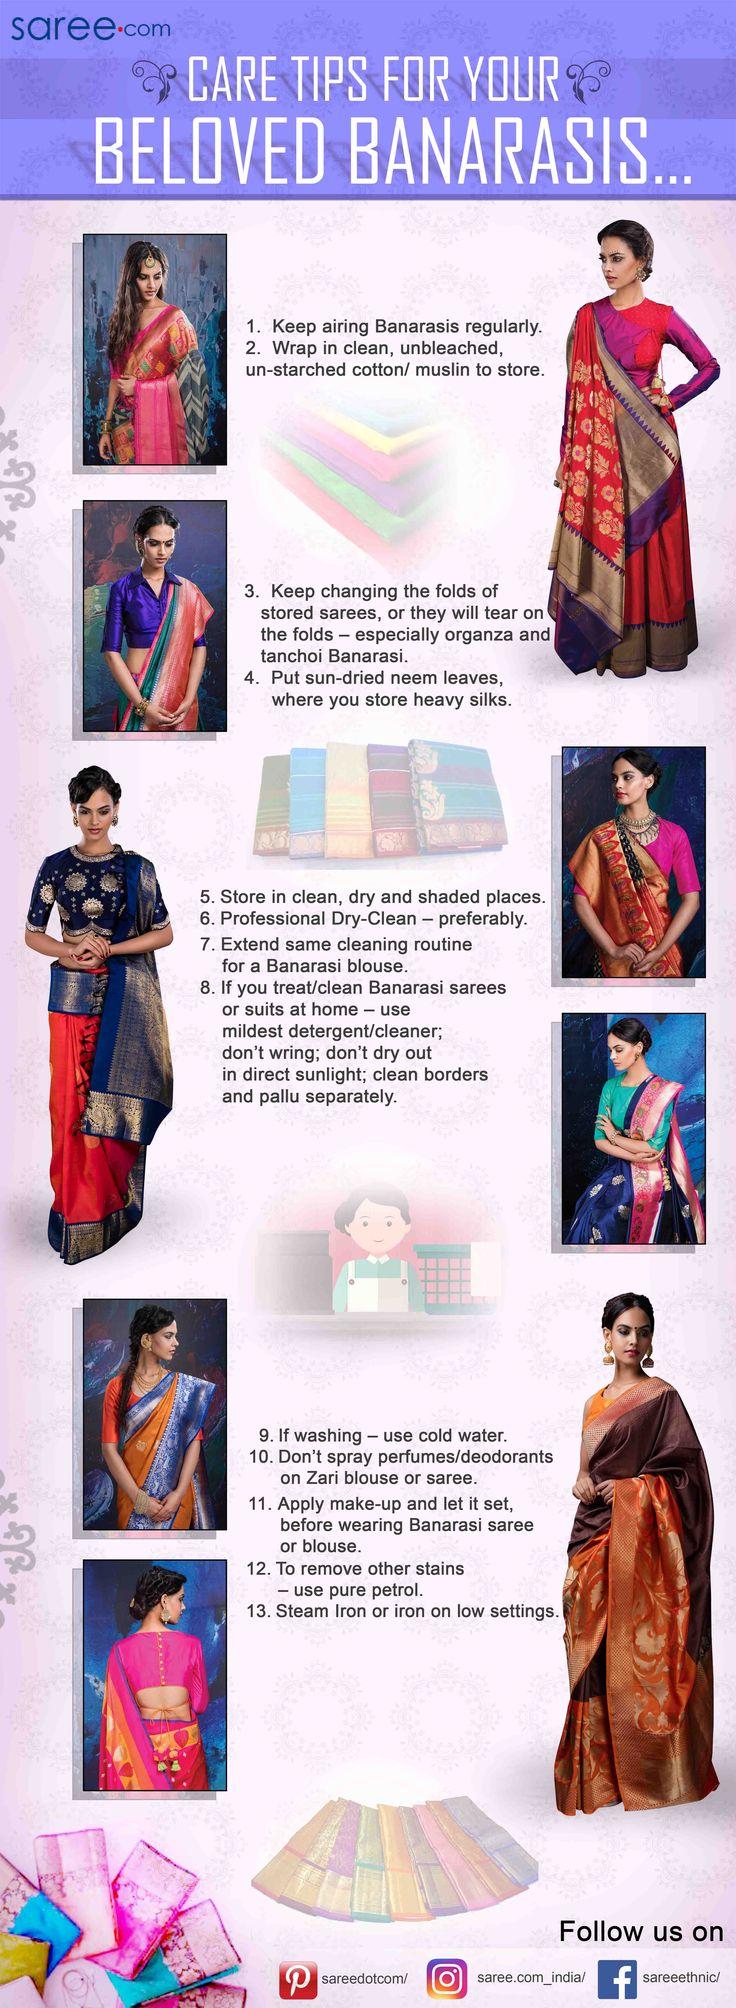 Reshmi Dhaga – the inspiring journey of delicate silken yarn to luxe Banarasi Sarees! [Infographic] #SilkSarees #BanarasiSaree #Sarees #Sari #SareeFashion #FashionIndia #IndianSarees #FashionDiaries #HandloomSilkSaree #PureHandloomSilkSarees